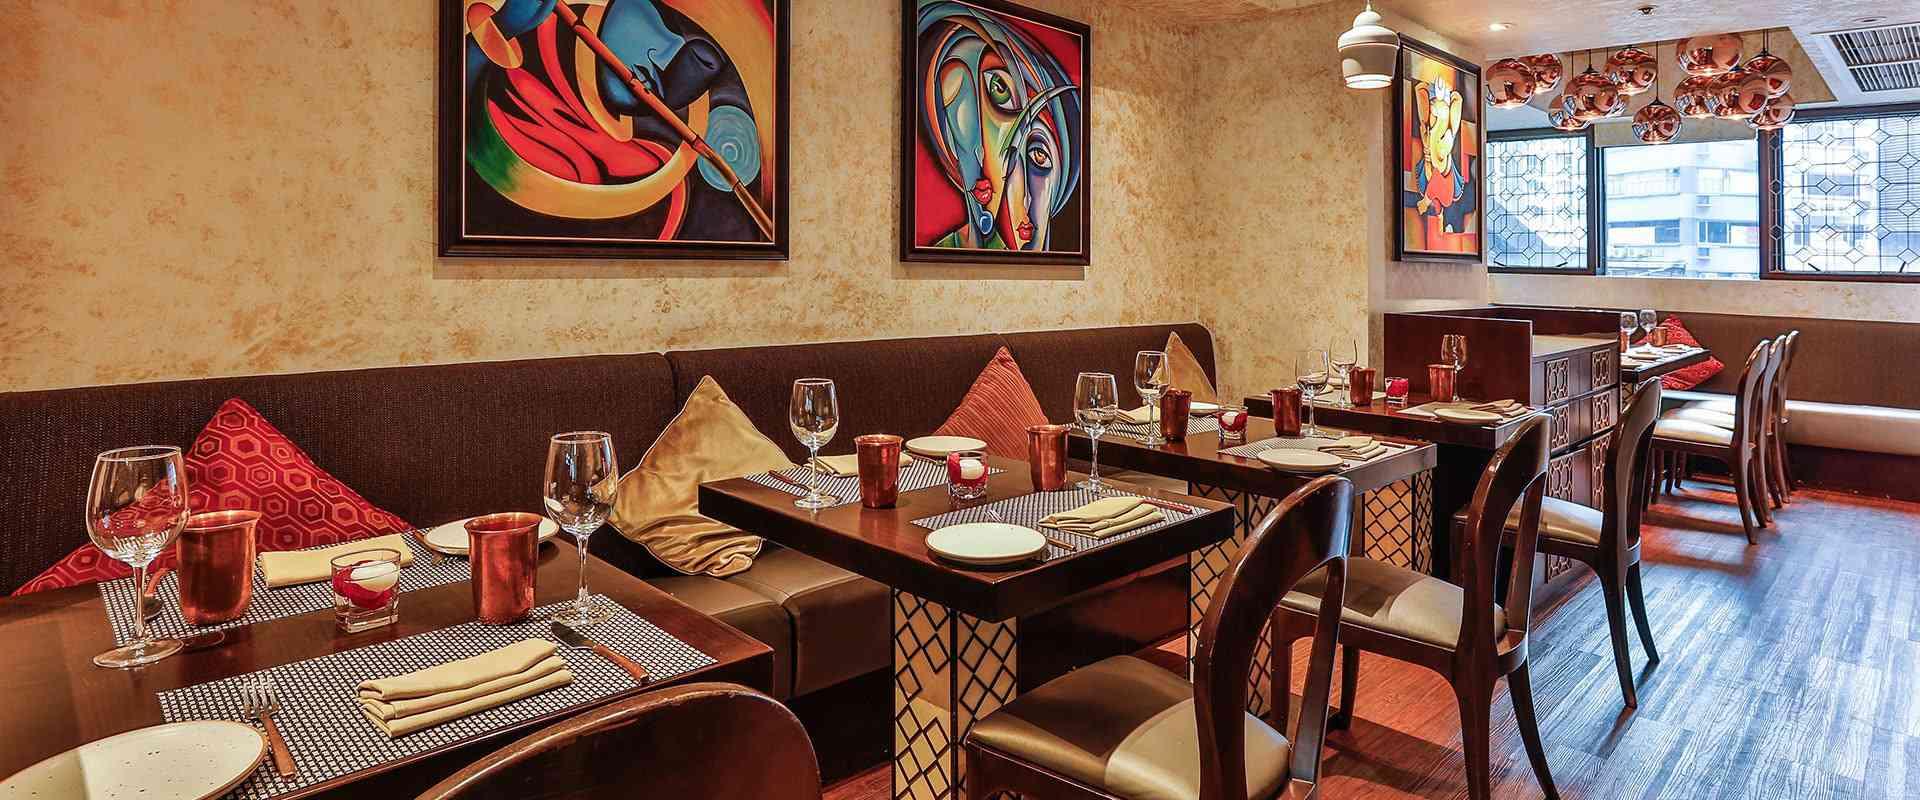 Tables inside Jashan, an Indian food buffet in Hong Kong